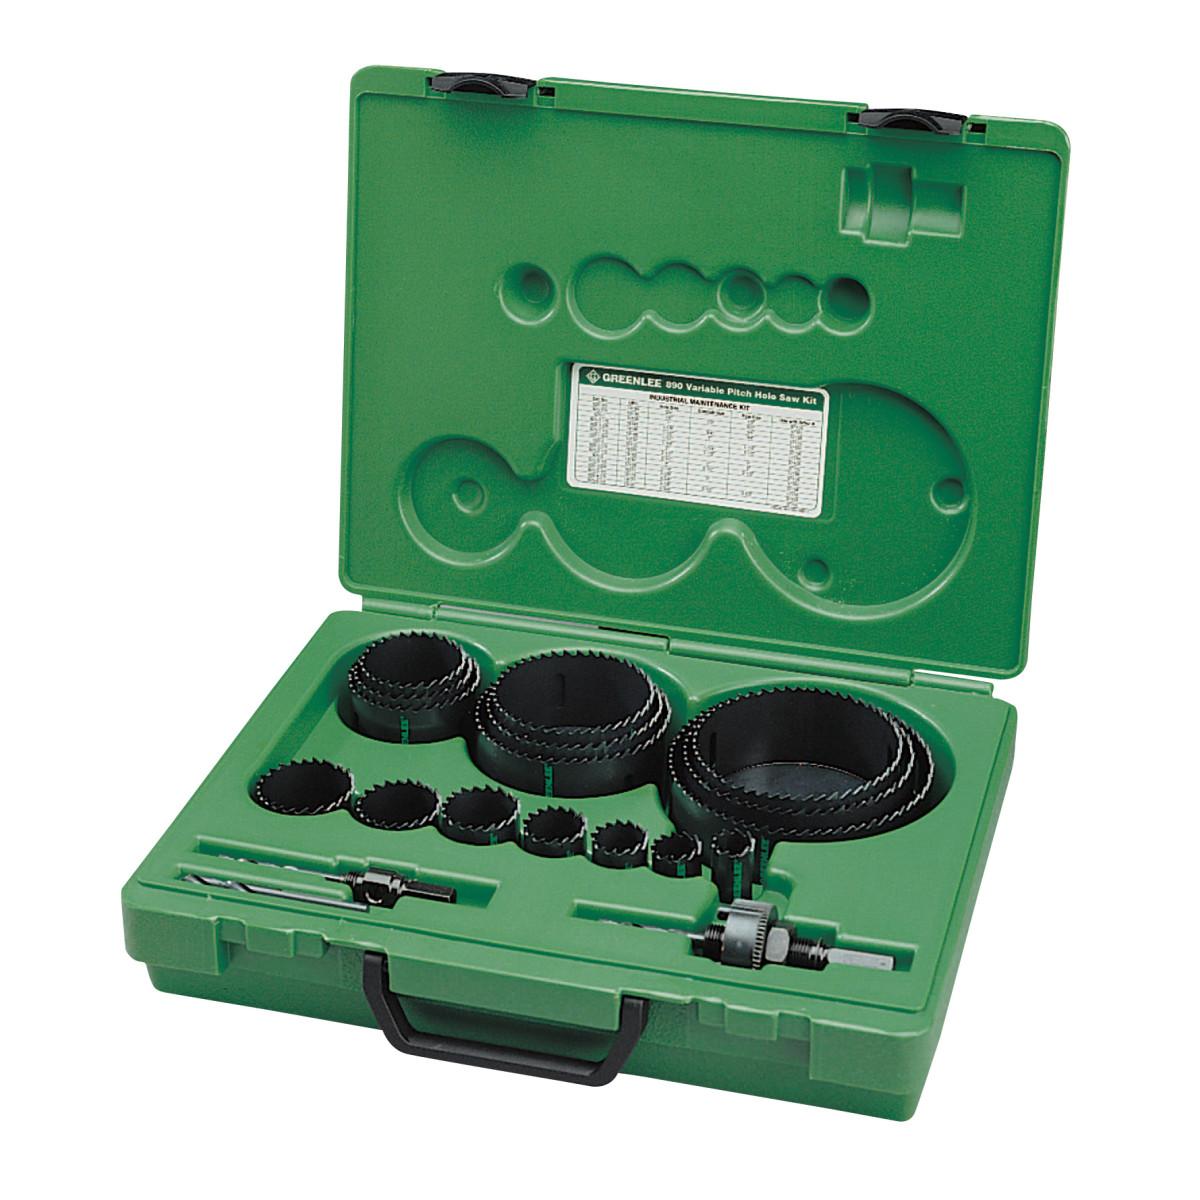 "Greenlee 890 Industrial Maintenance Hole Saw Kit - 3/4"" thru 4-3/4"", with Case"